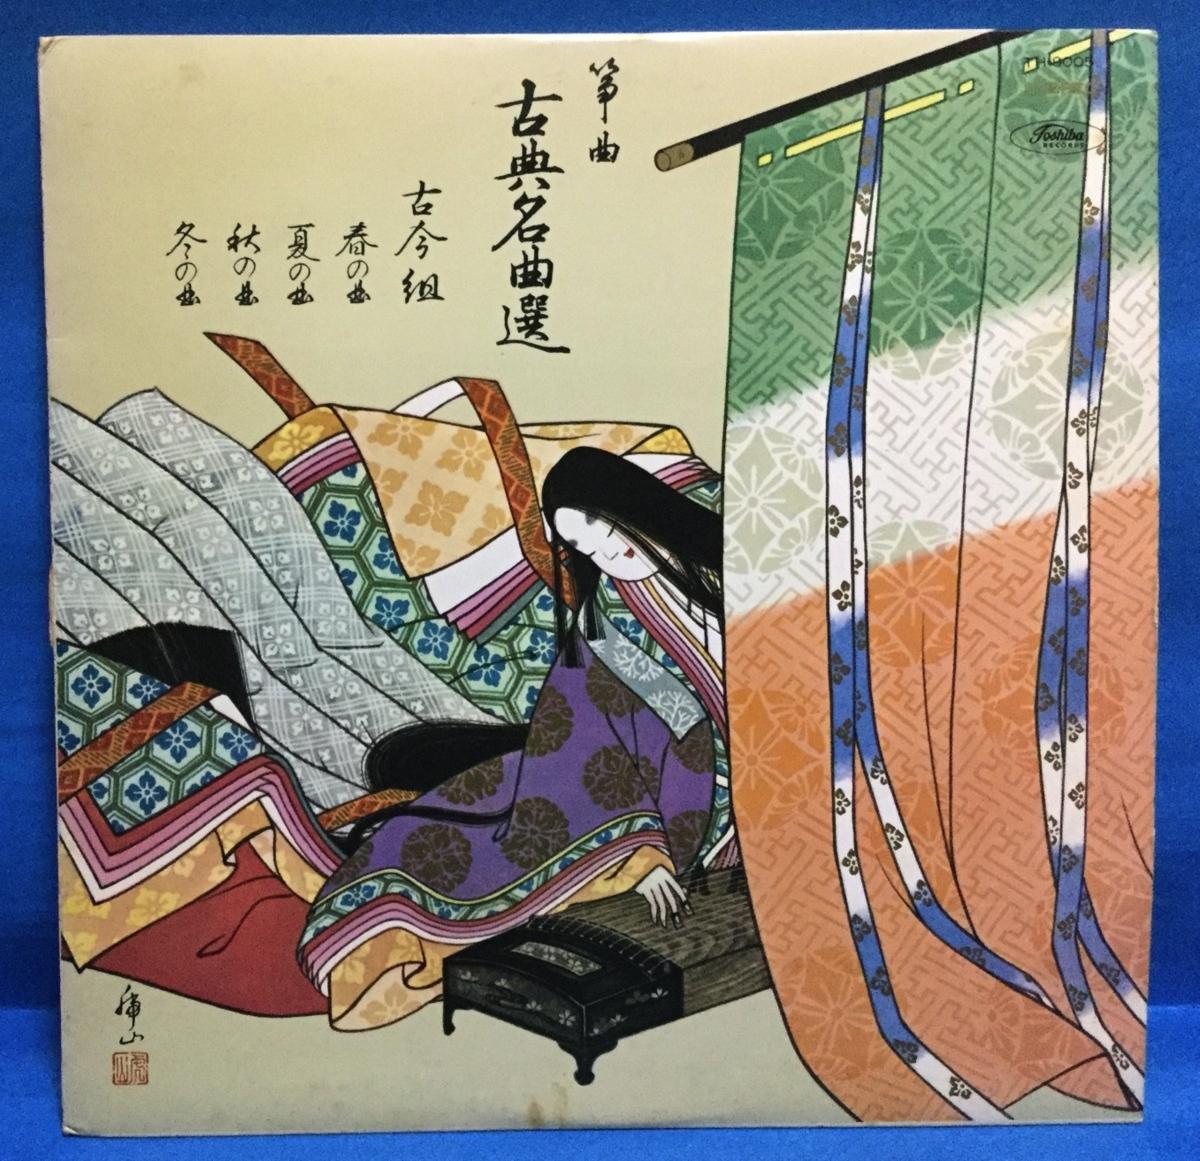 LP その他 筝曲 古典名曲選 古今組_画像1